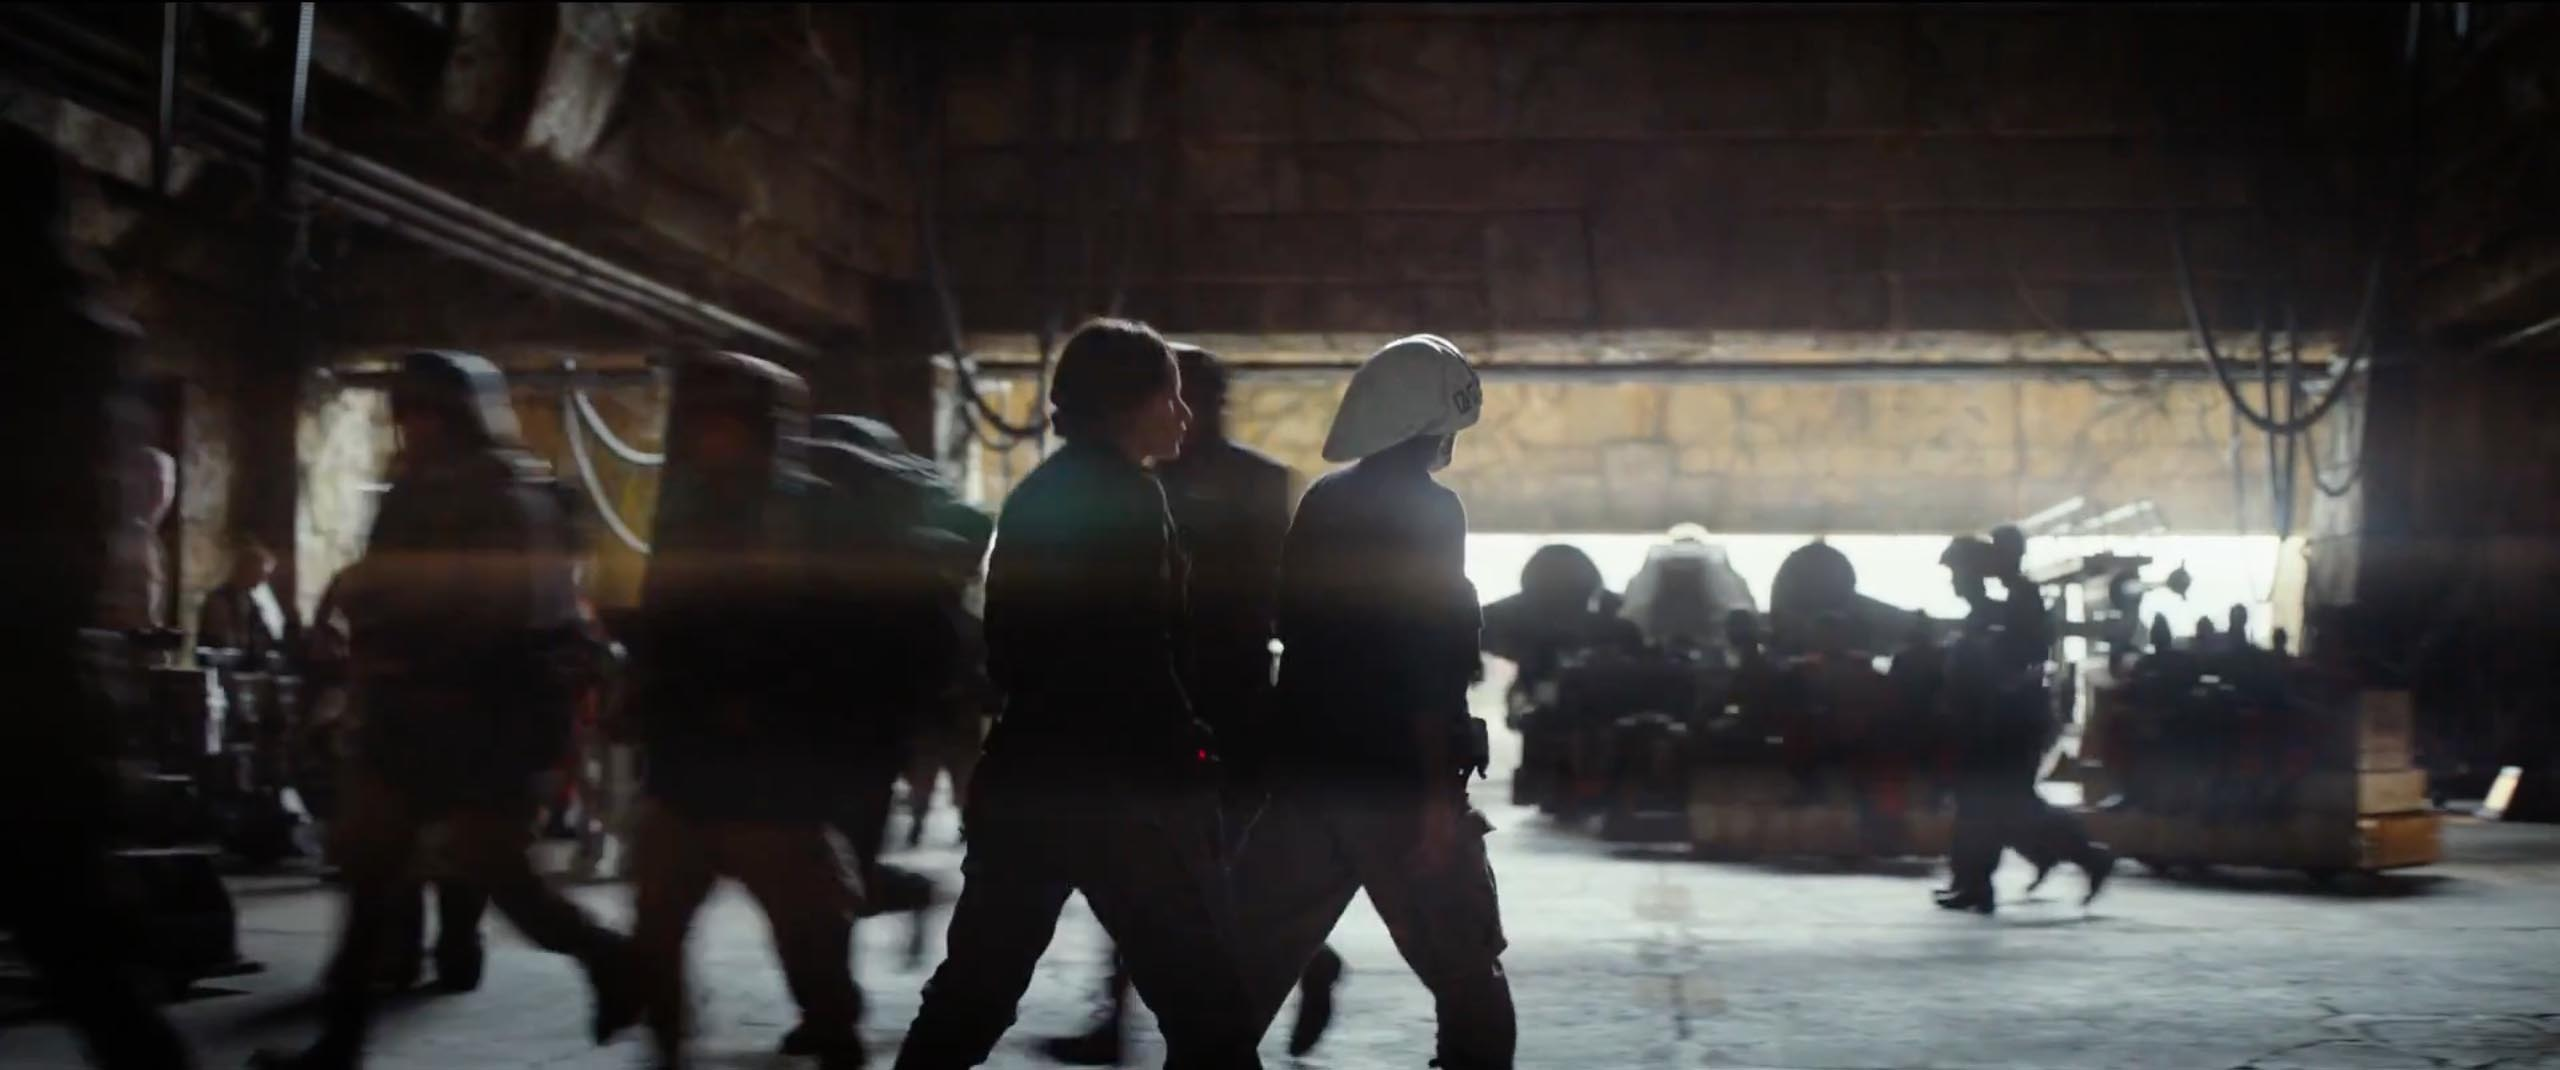 Star Wars Episode IX filming location